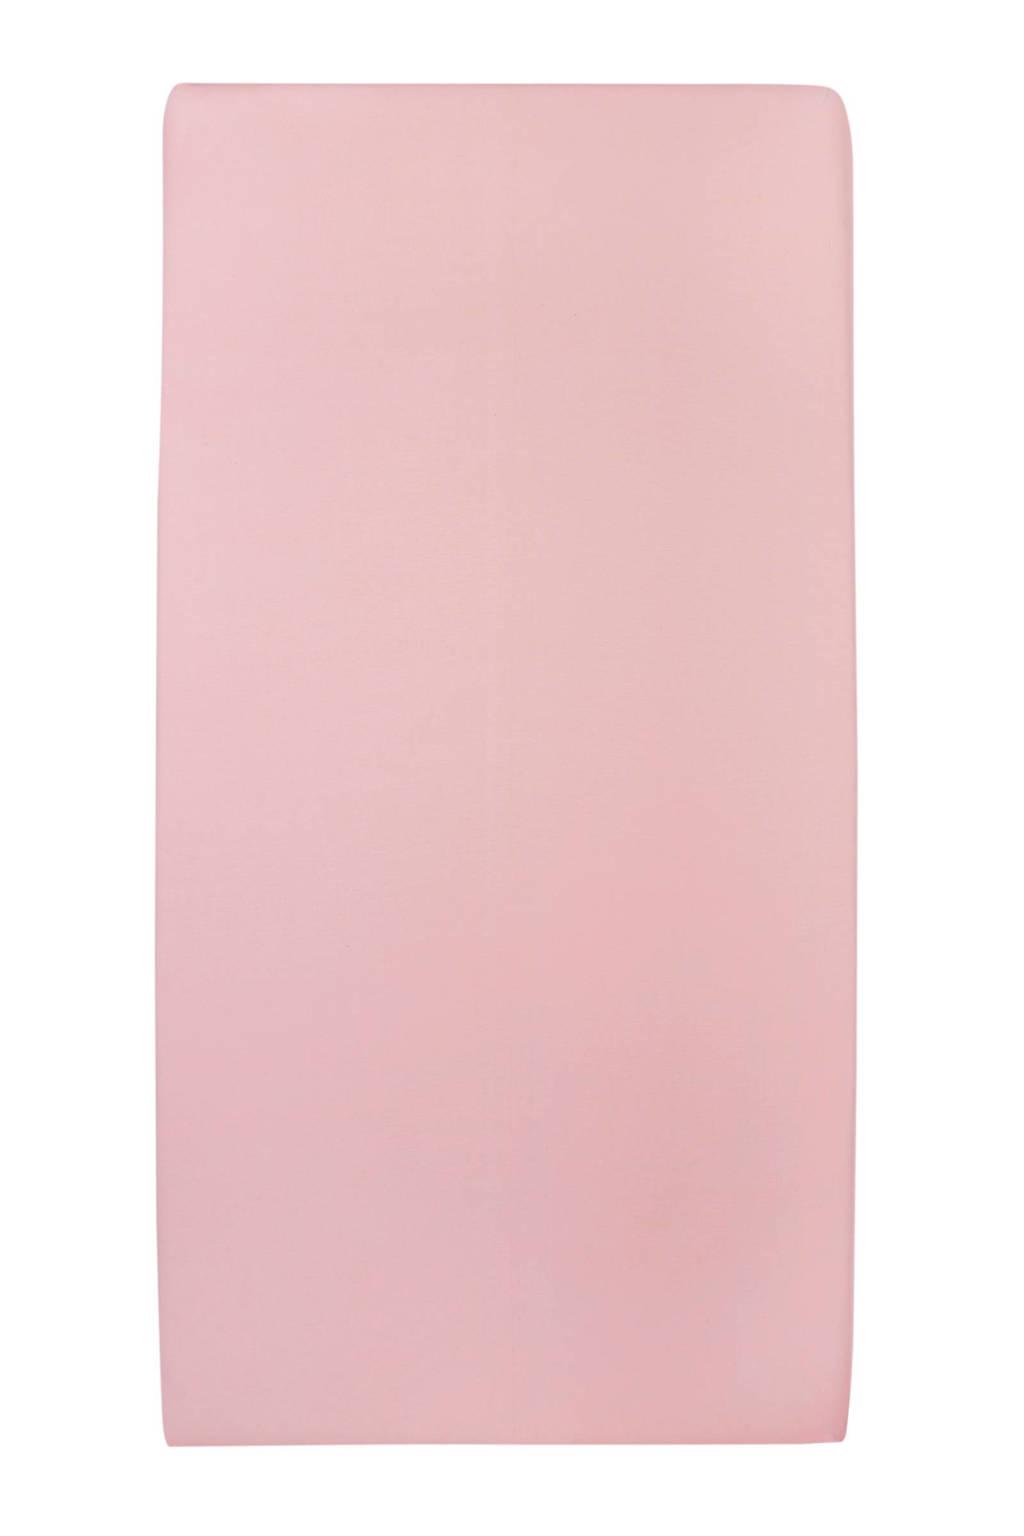 Meyco jersey hoeslaken peuterbed 70x140/150 cm Oudroze